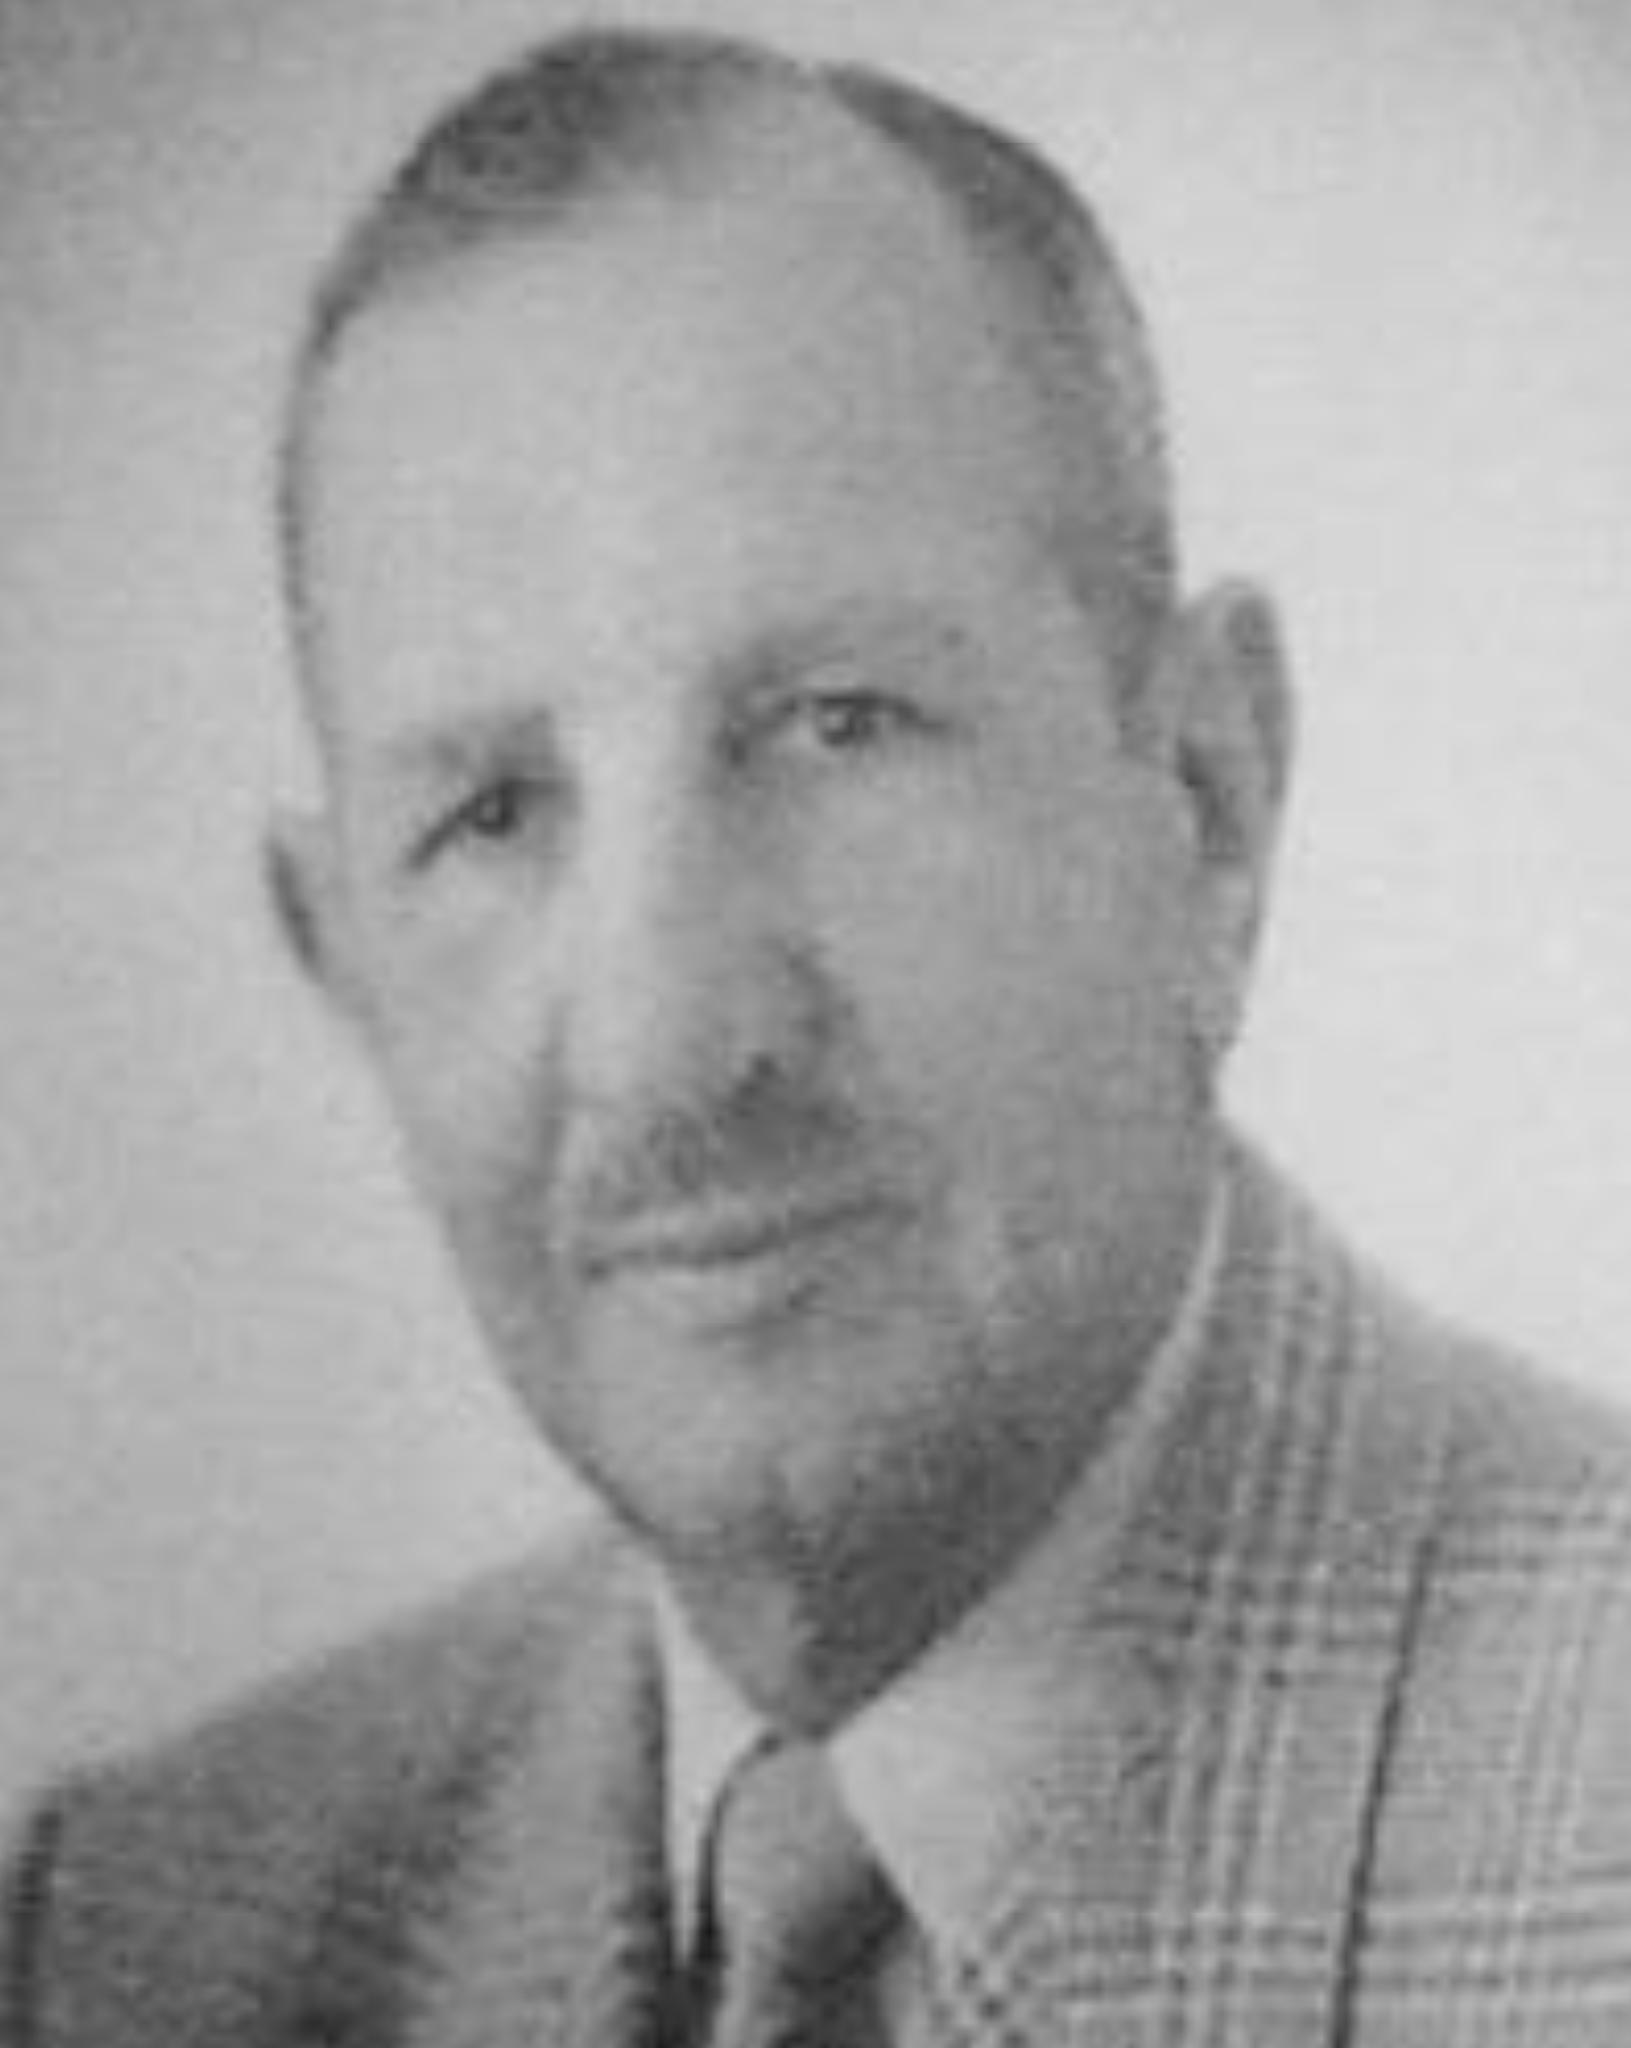 WILLIS L. HARTMAN